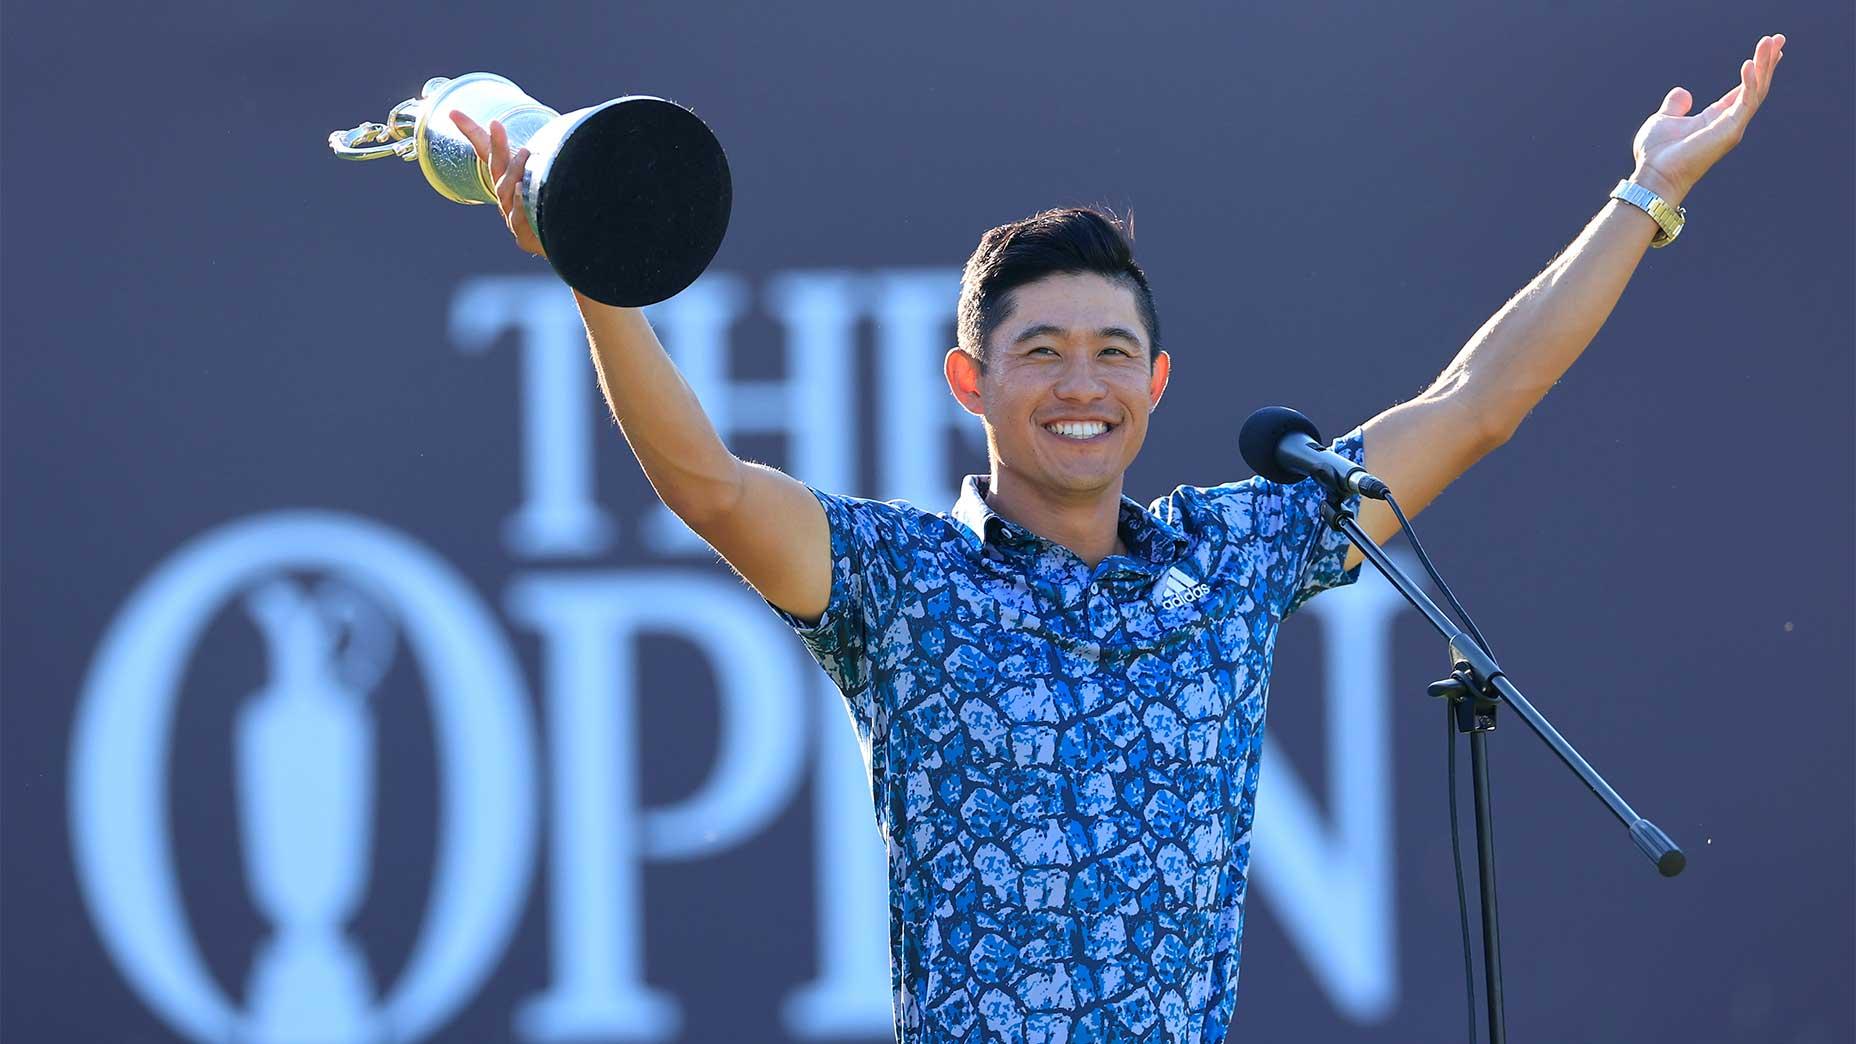 Winning big on The Open